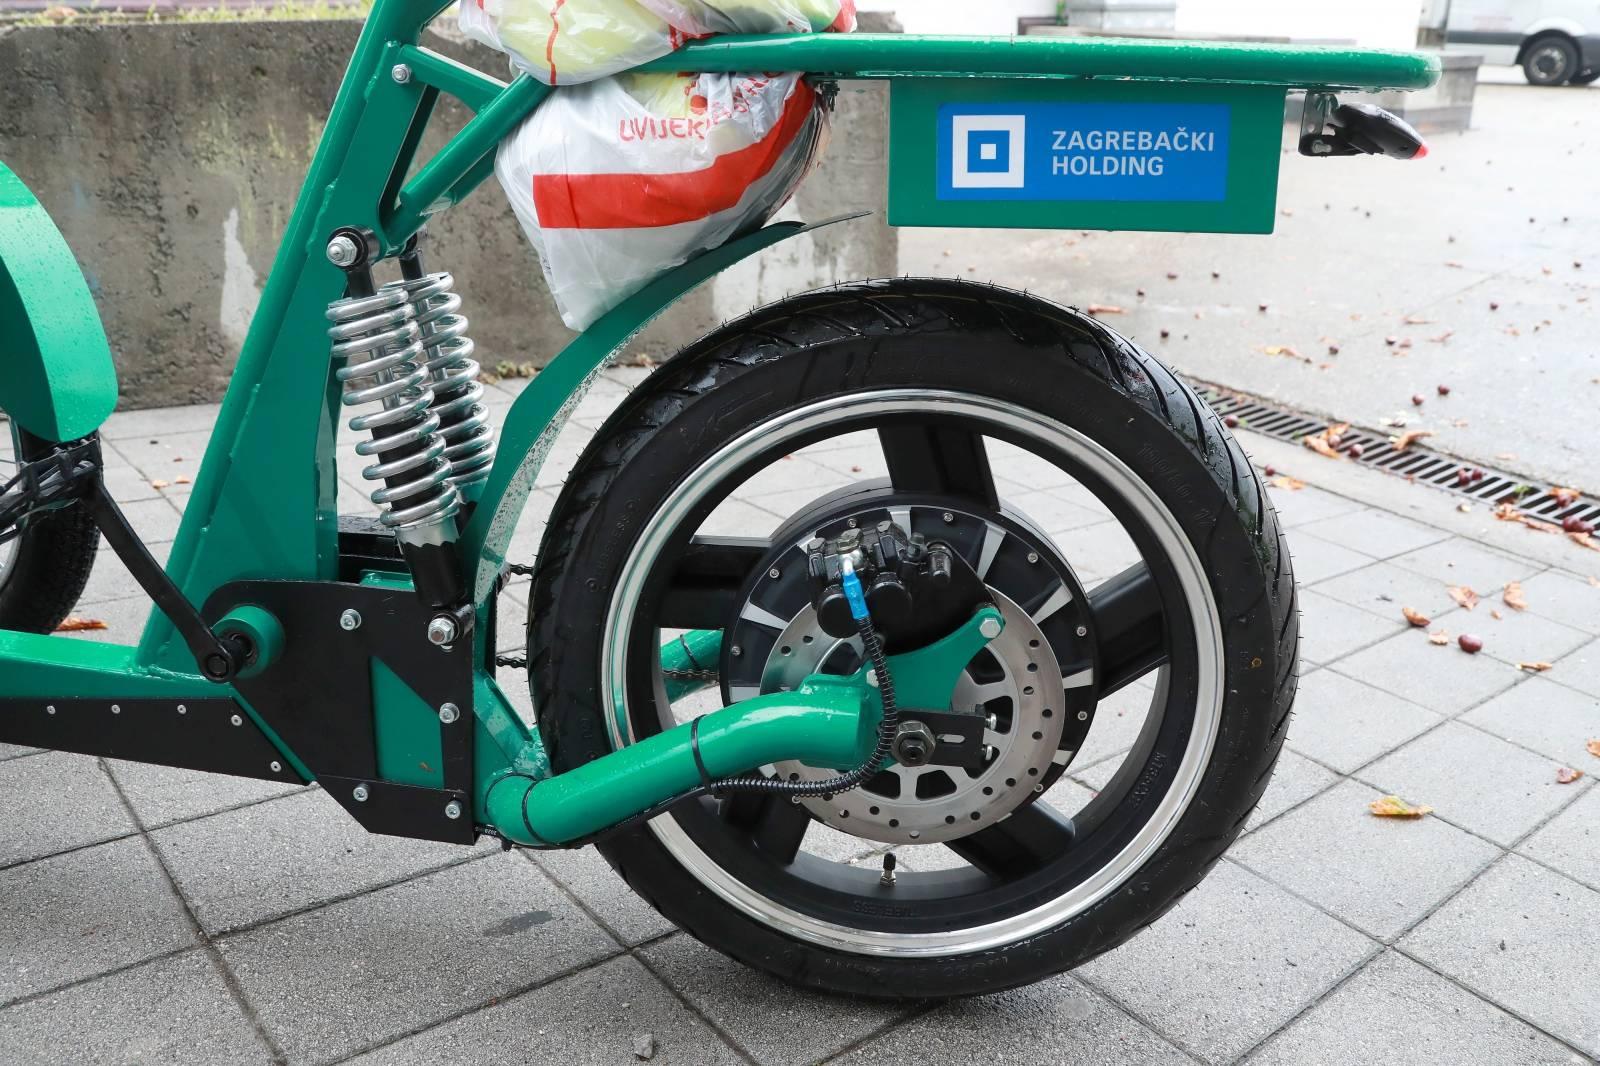 Zagreb: Radnici Čistoće dobili električni bicikl s kantom